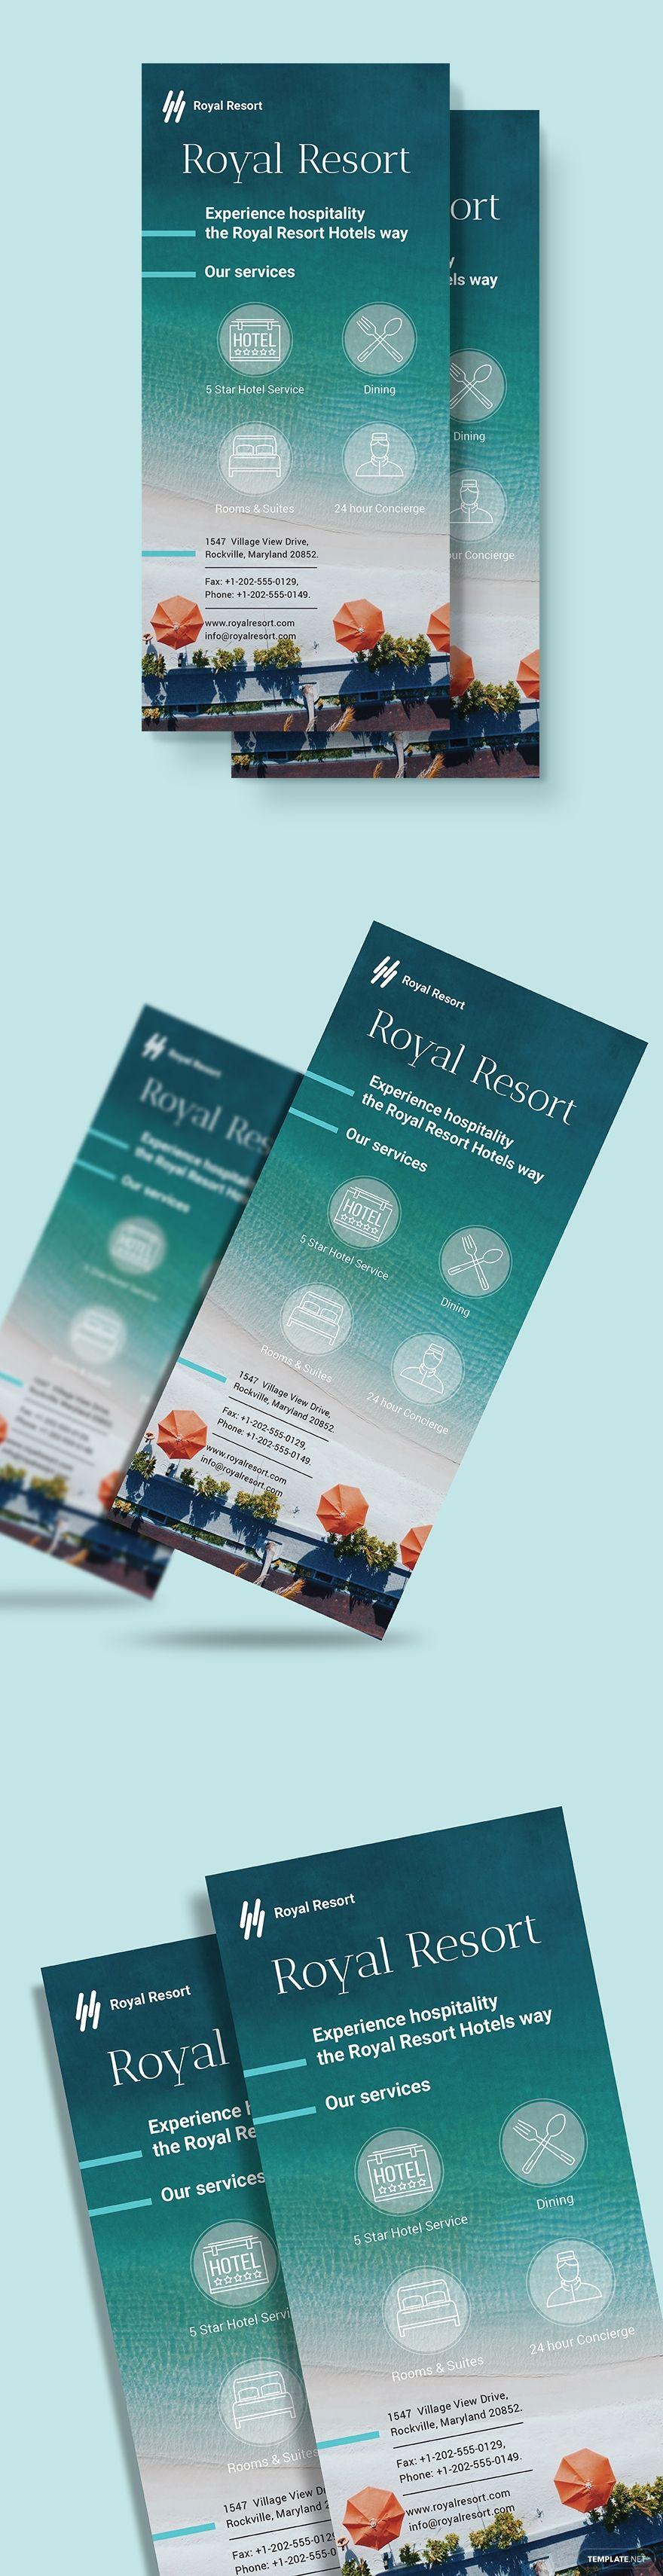 Royal Resort Rack Card Template Word Psd Indesign Apple Pages Publisher Illustrator Rack Card Templates Rack Card Card Template